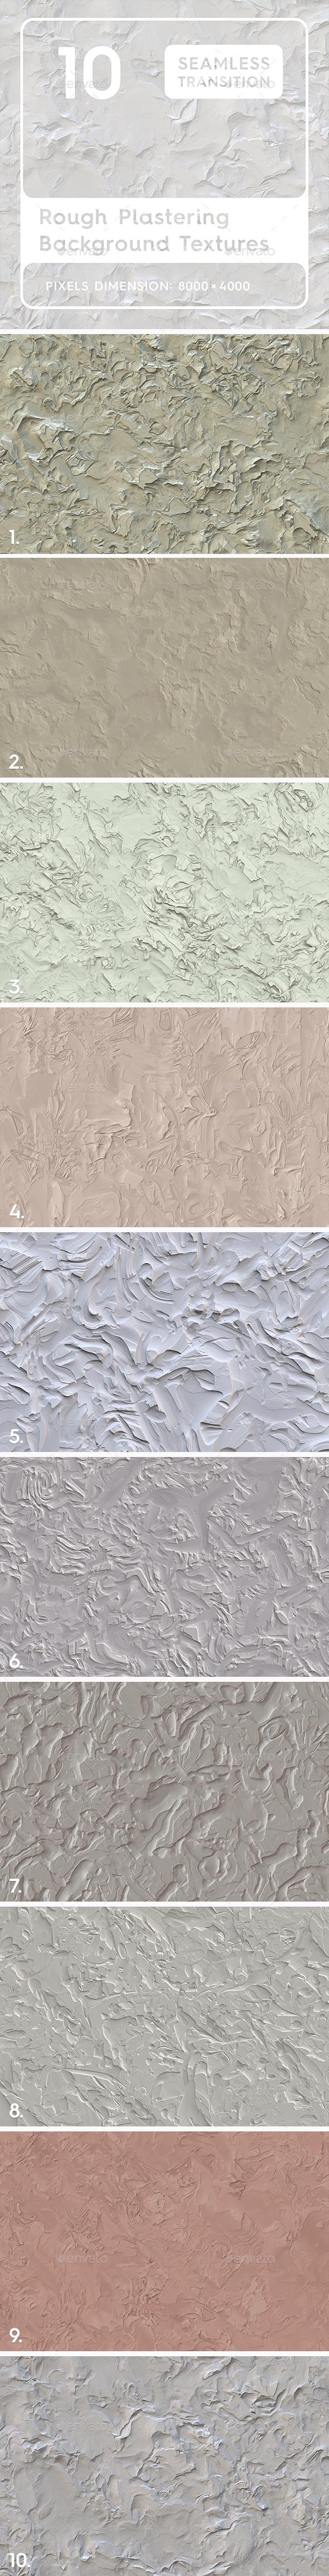 10 Rough Plastering Textures - Industrial / Grunge Textures